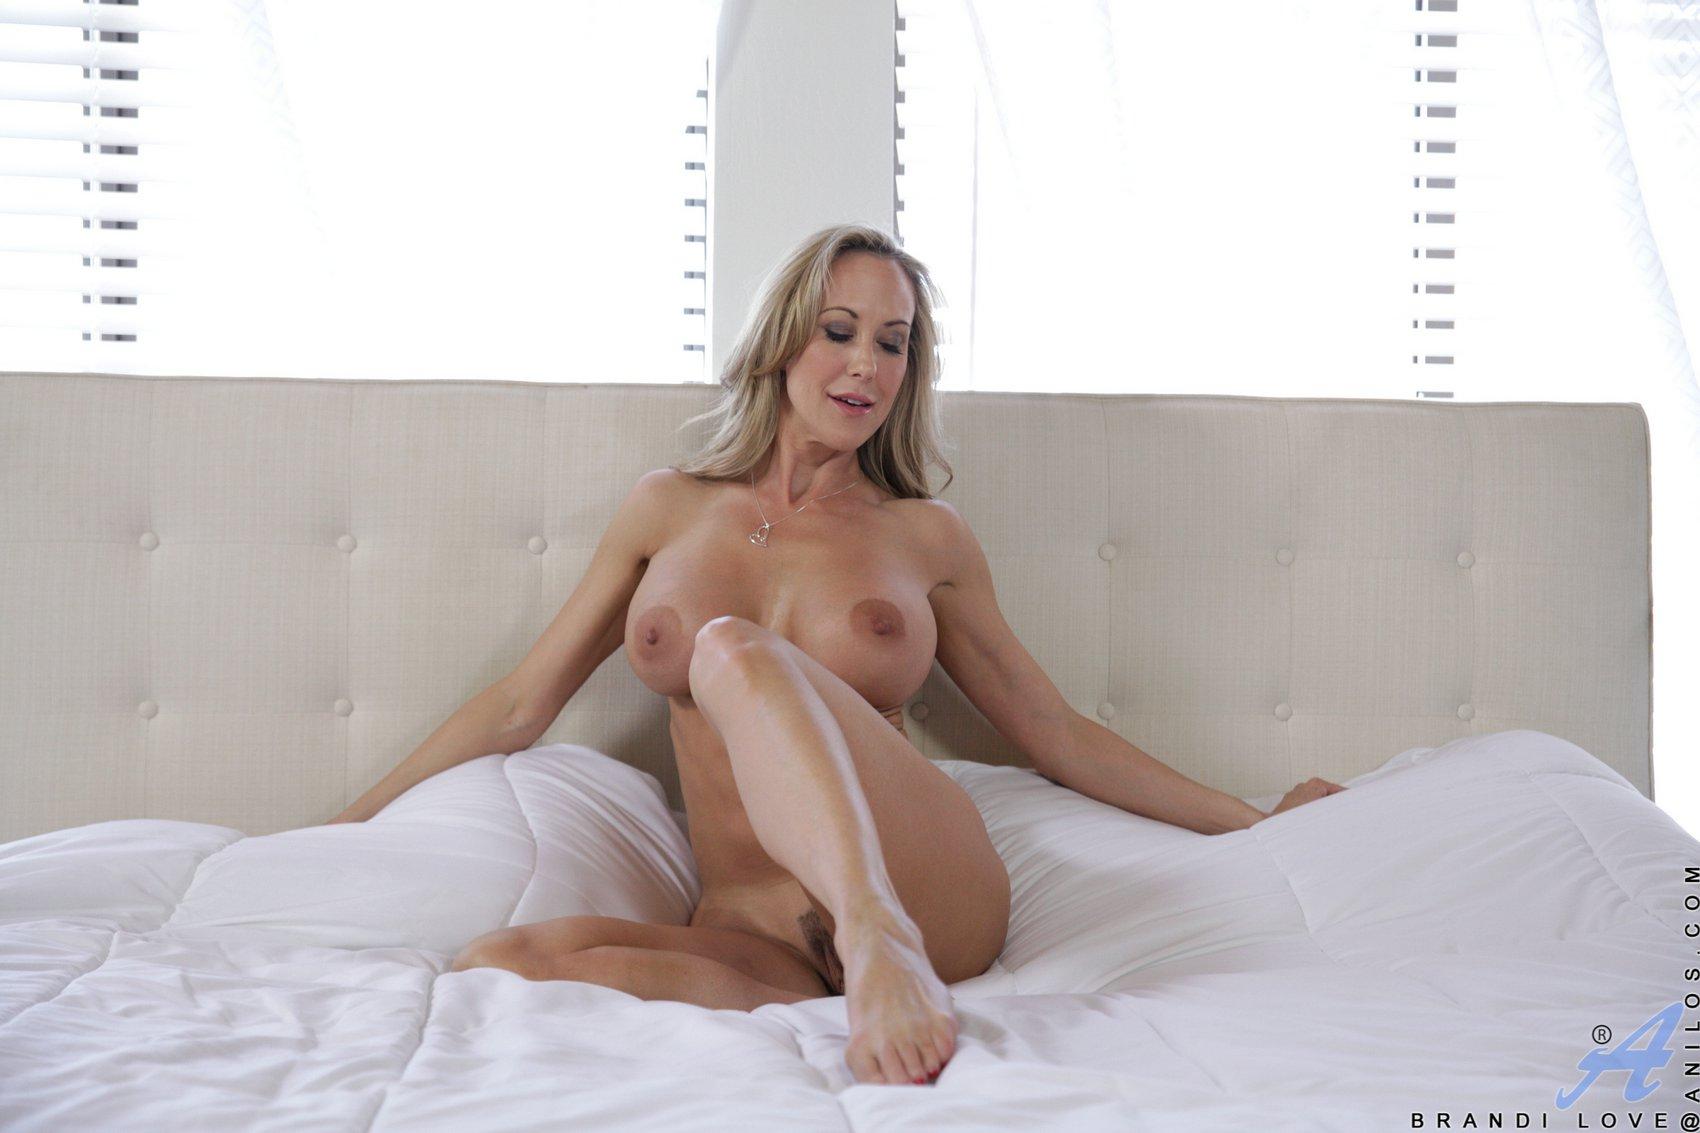 Erotic photos free access